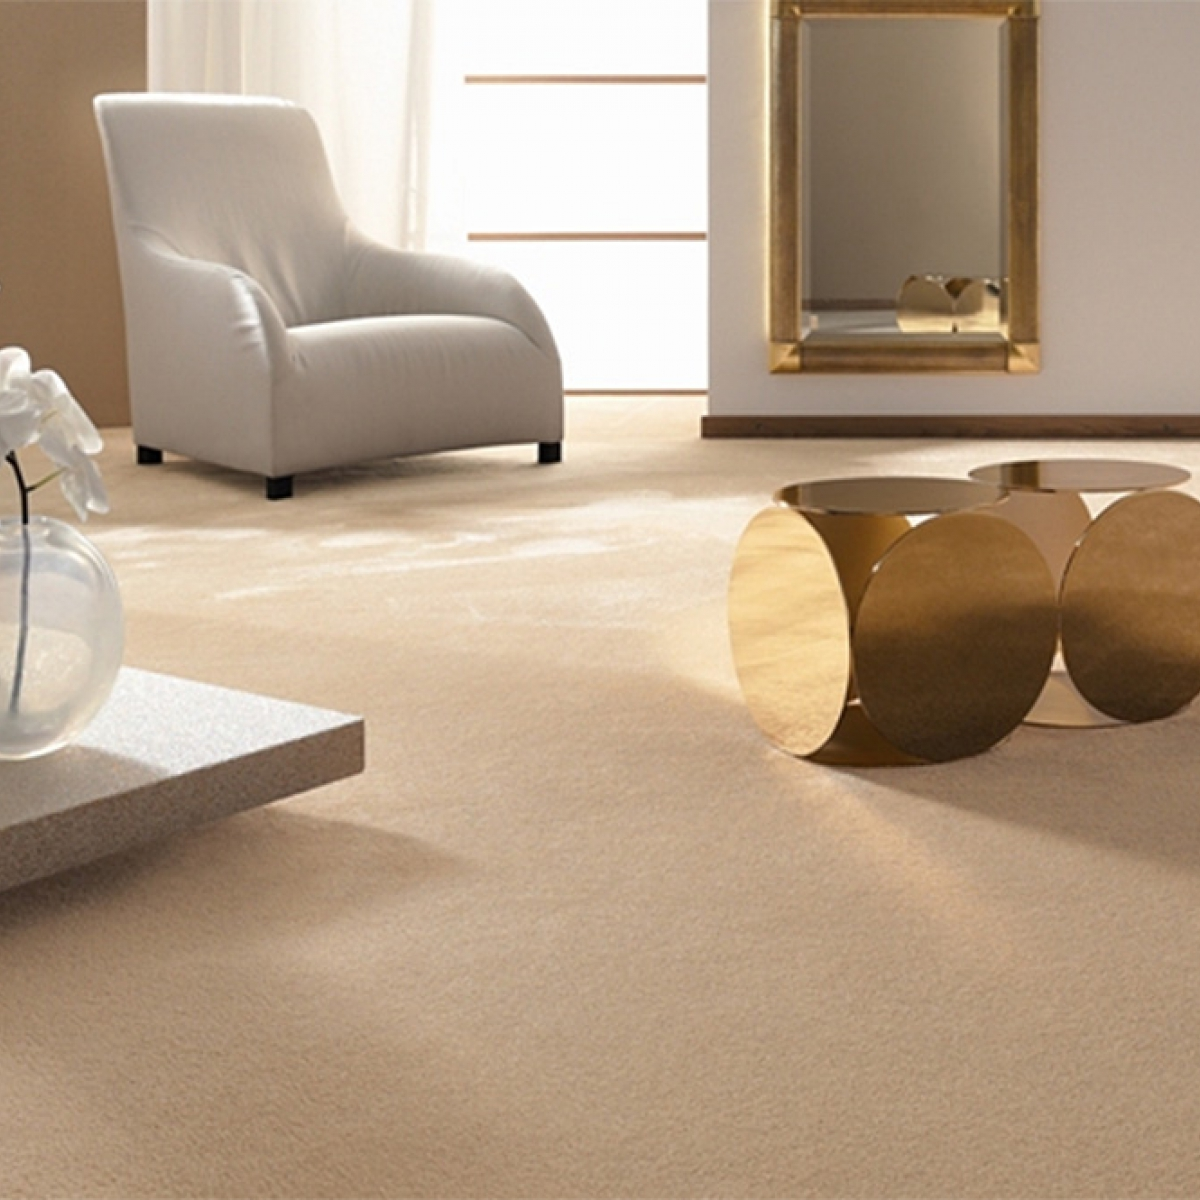 galerieleiste raumausstatter with ft sohn dortmund. Black Bedroom Furniture Sets. Home Design Ideas